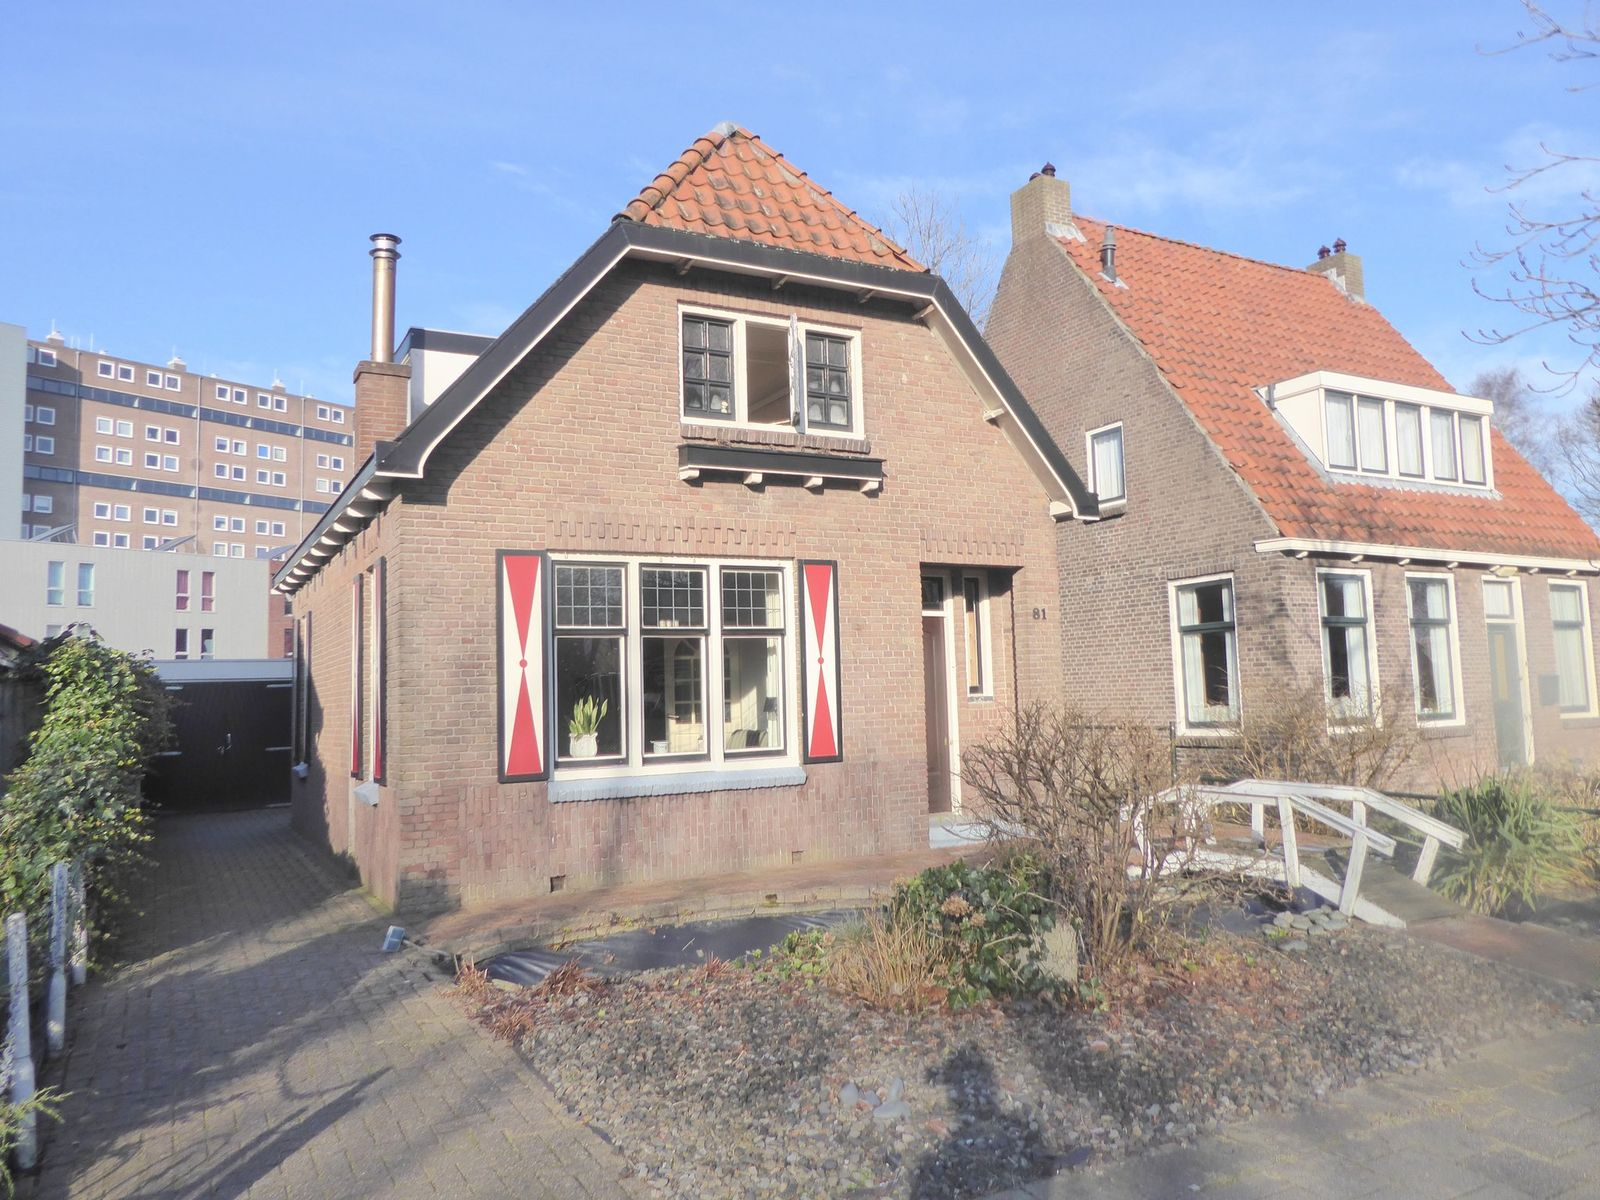 Lekkumerweg 81, Leeuwarden